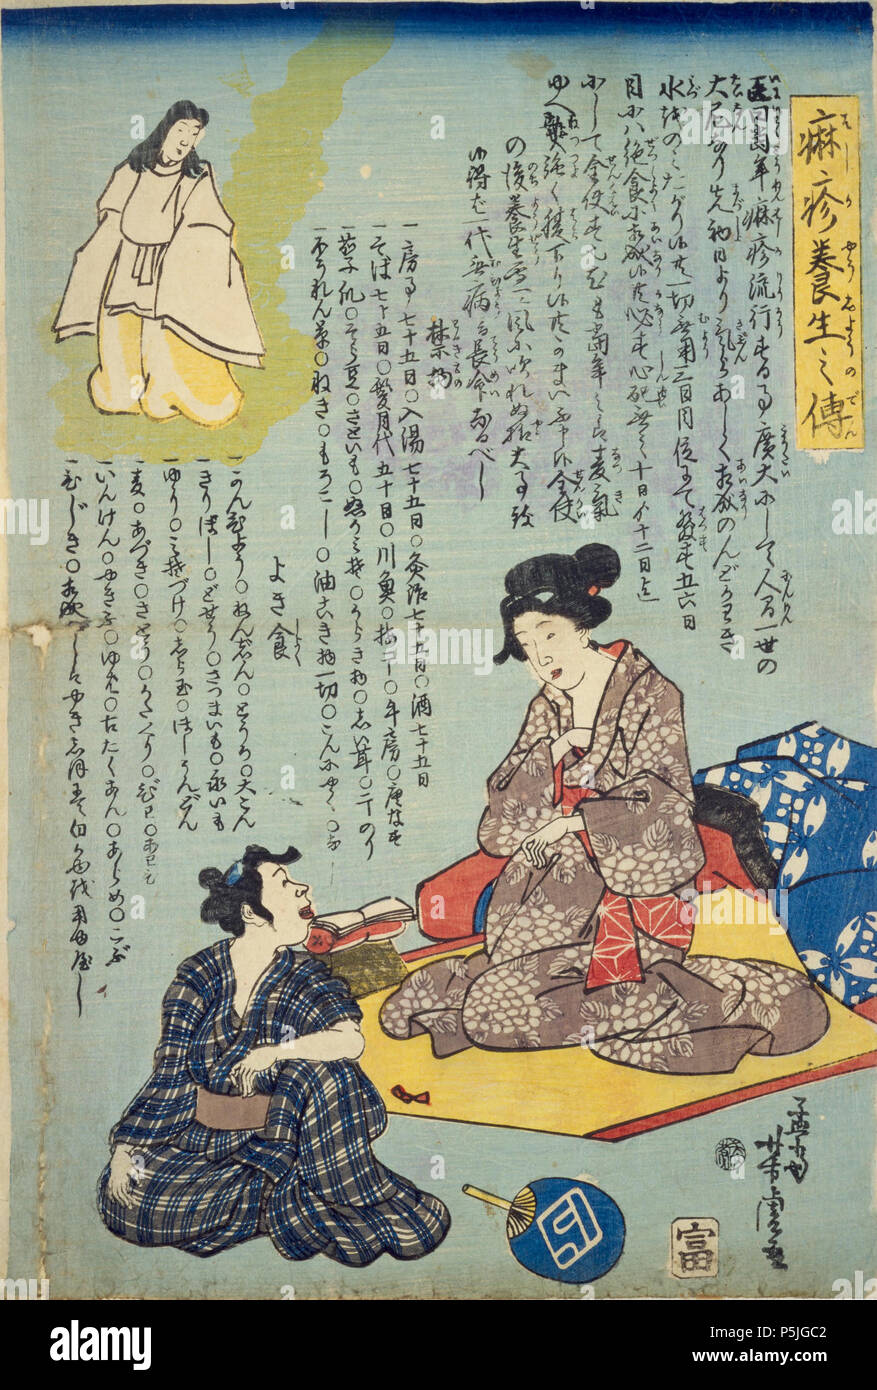 Mashin Yojo no den (medical treatment of measles), 1862,  Artist Utagawa Yoshitora. - Stock Image